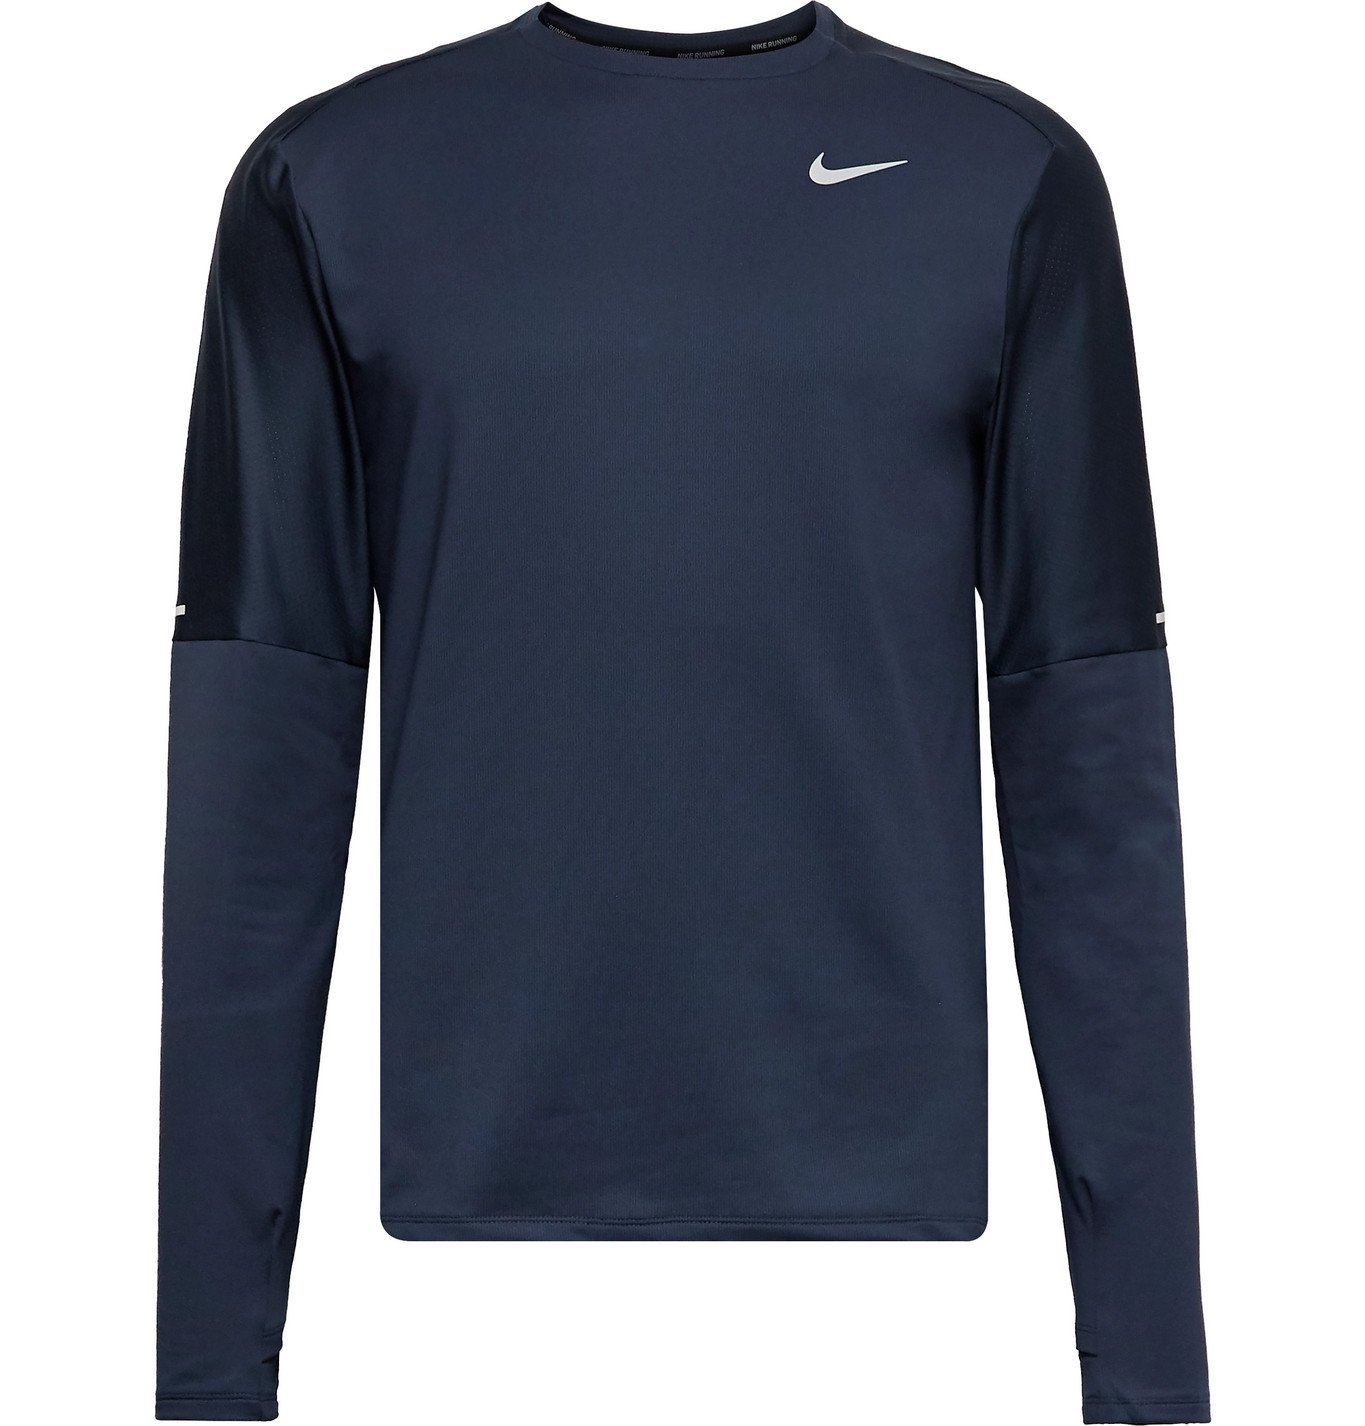 Nike Running - Element Mesh-Trimmed Logo-Print Dri-FIT Top - Blue